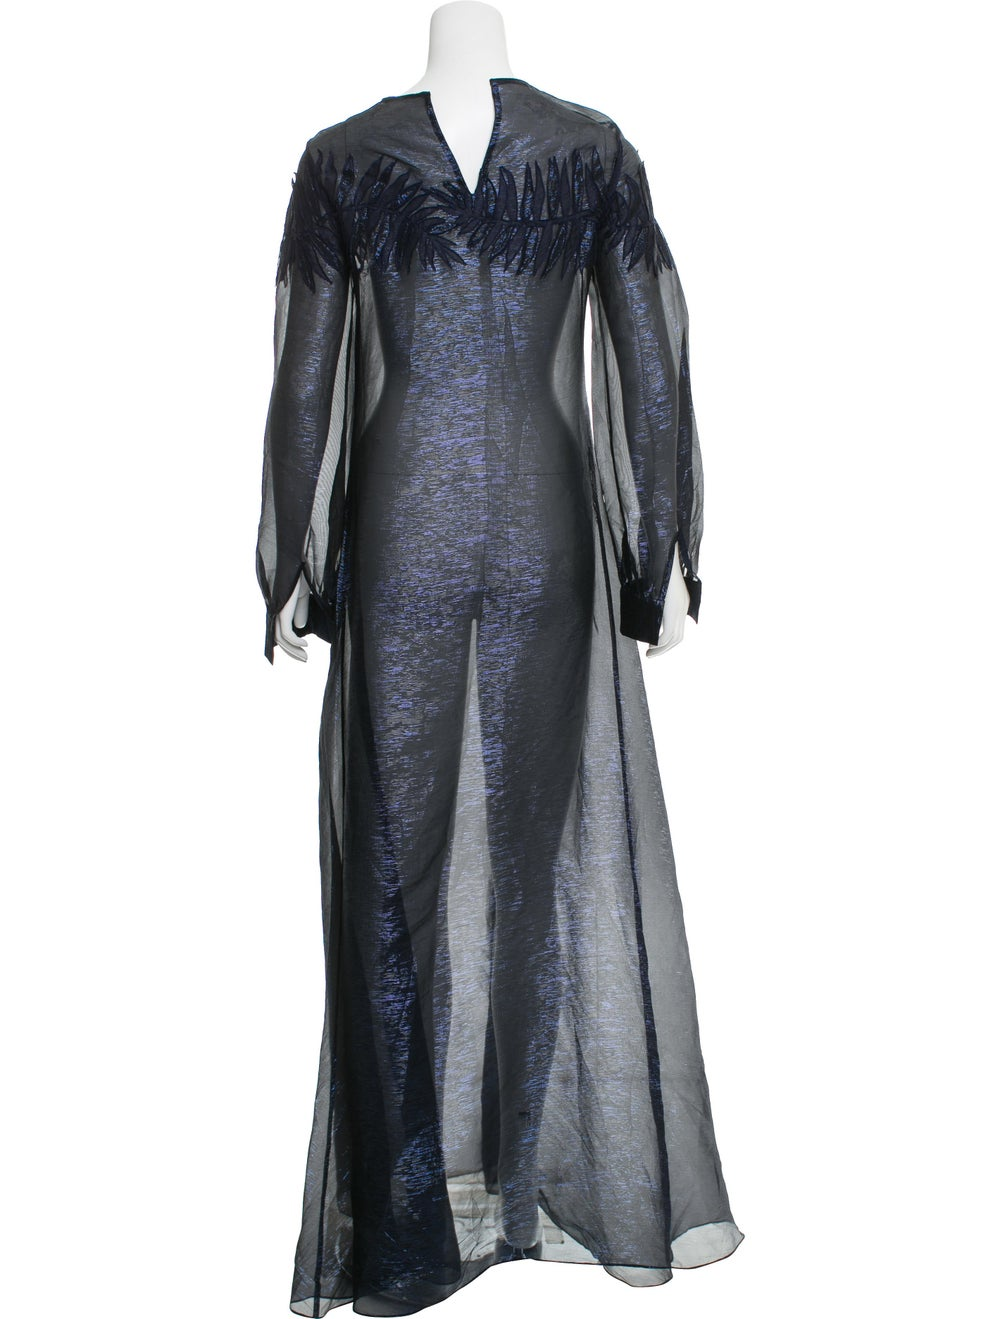 Oscar de la Renta Metallic Maxi Dress Navy - image 3